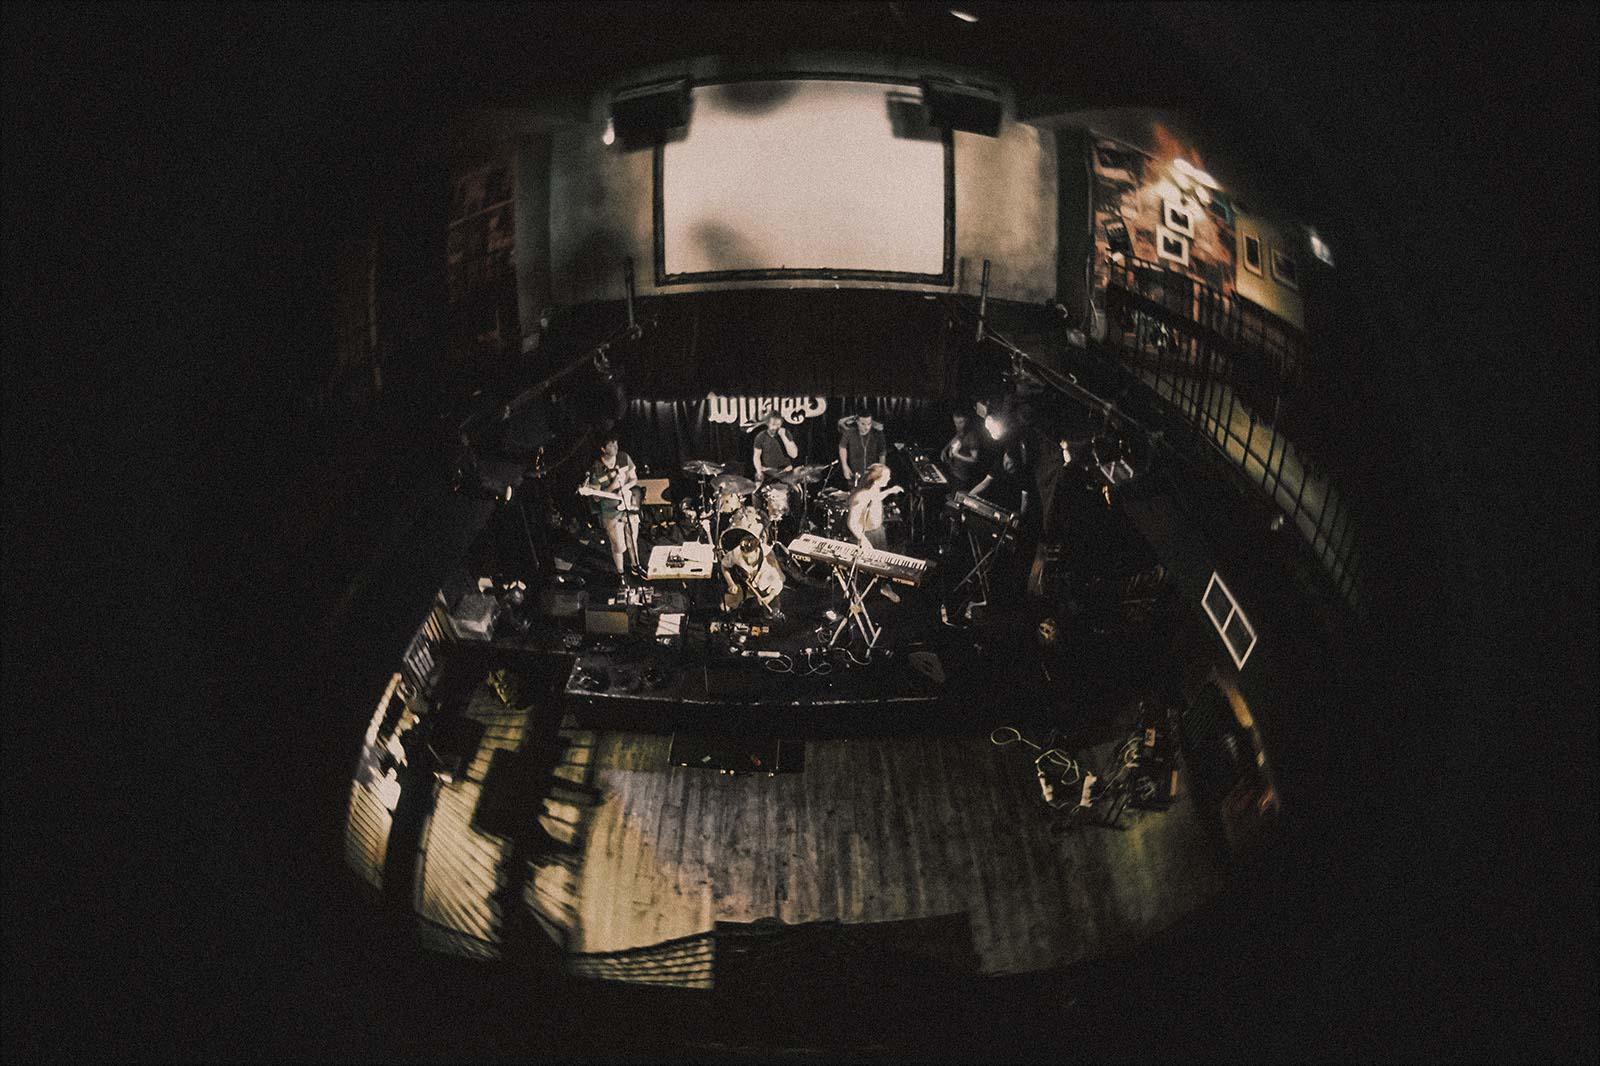 come_on_live_long_album_launch_whelans_dublin015.jpg